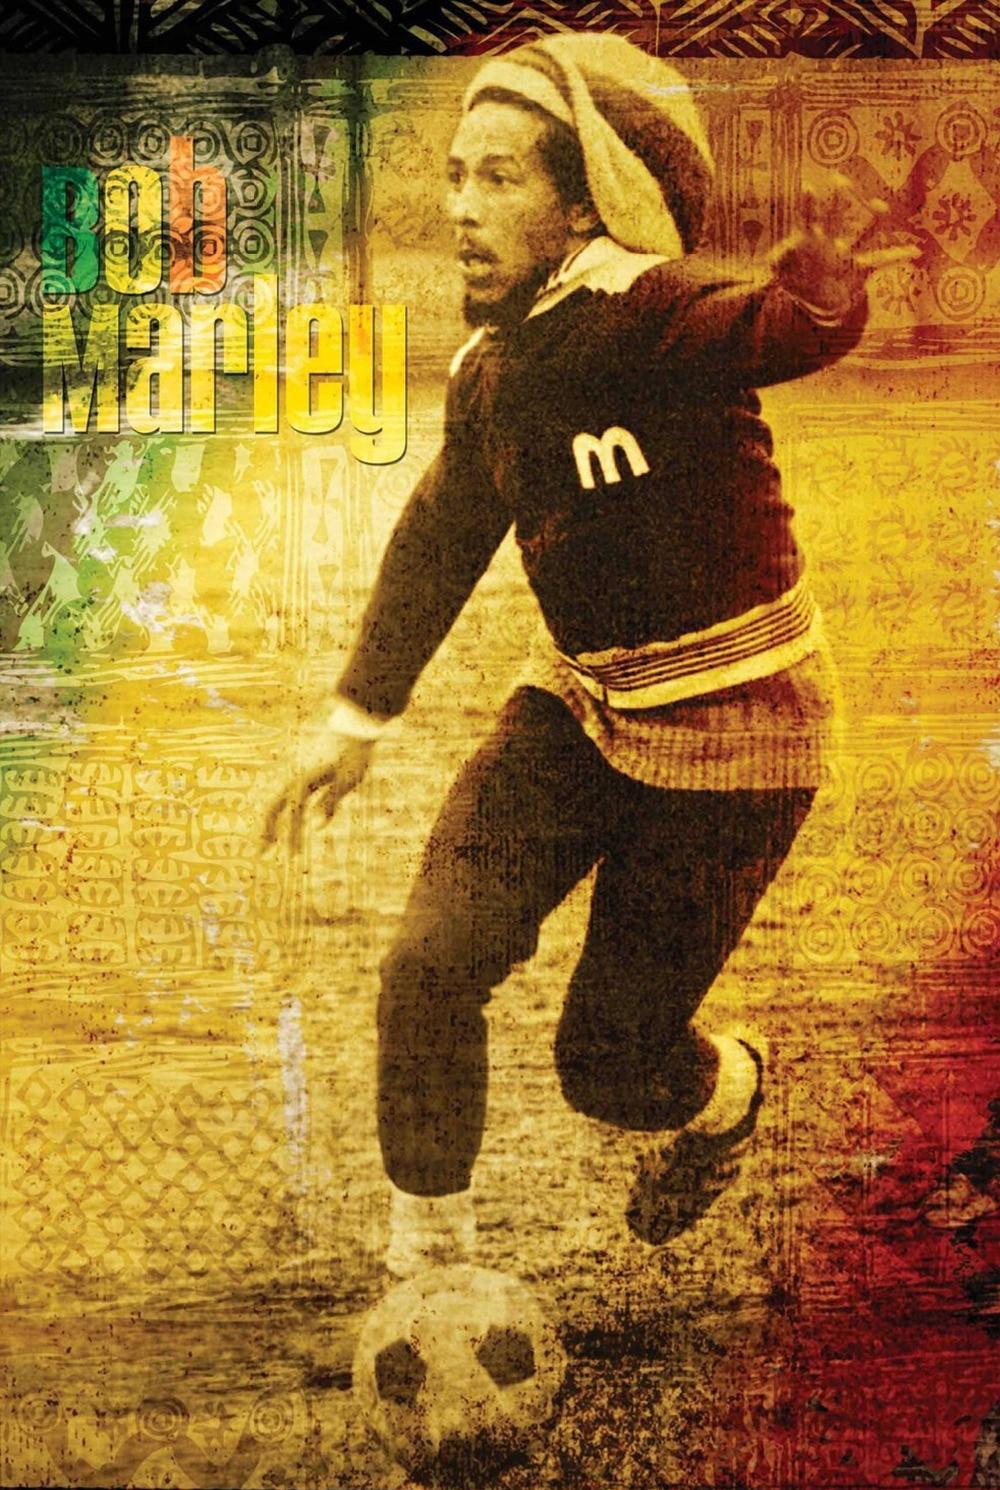 Hot Bob Marley Play Football Stylish Classical Decor Fashionable